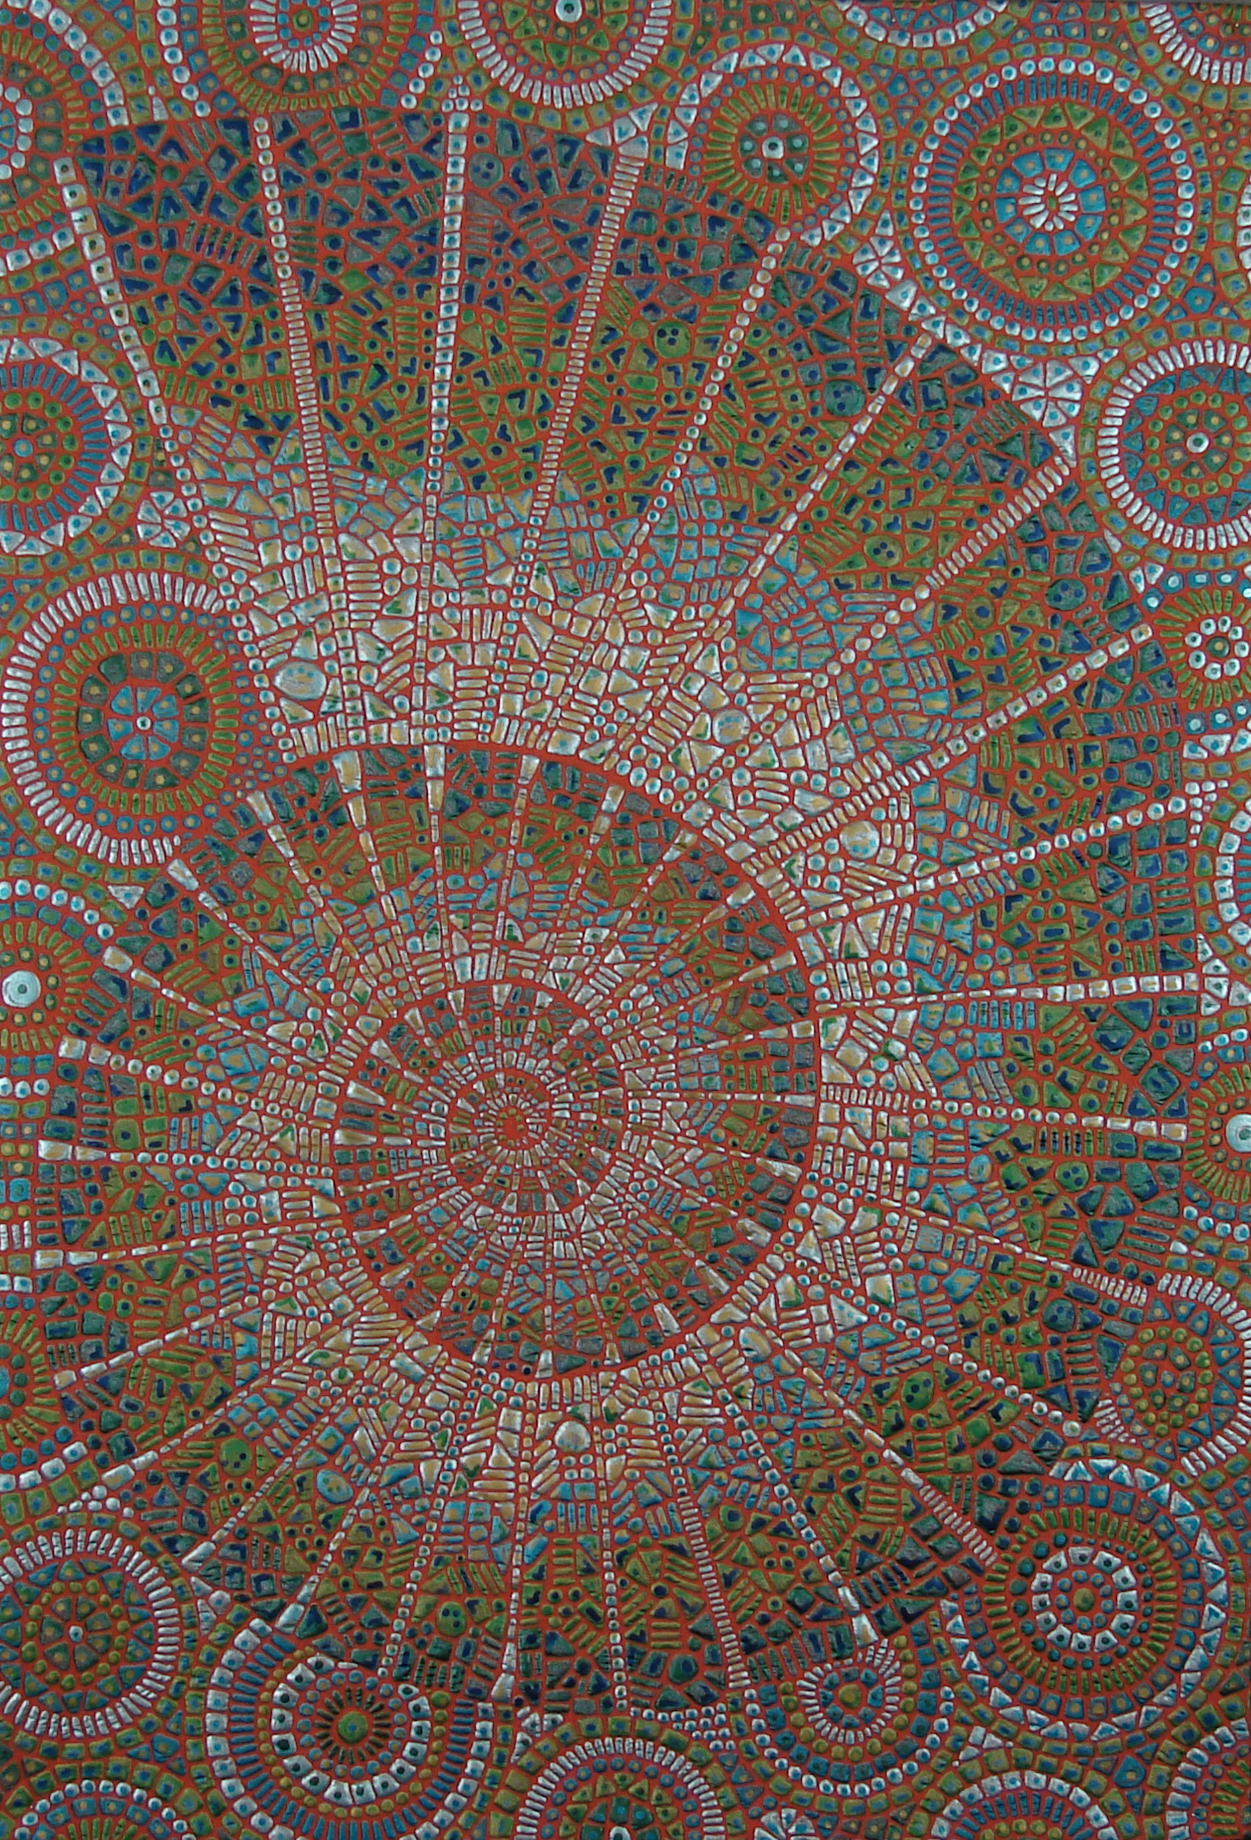 Copper Enamel Ammonite